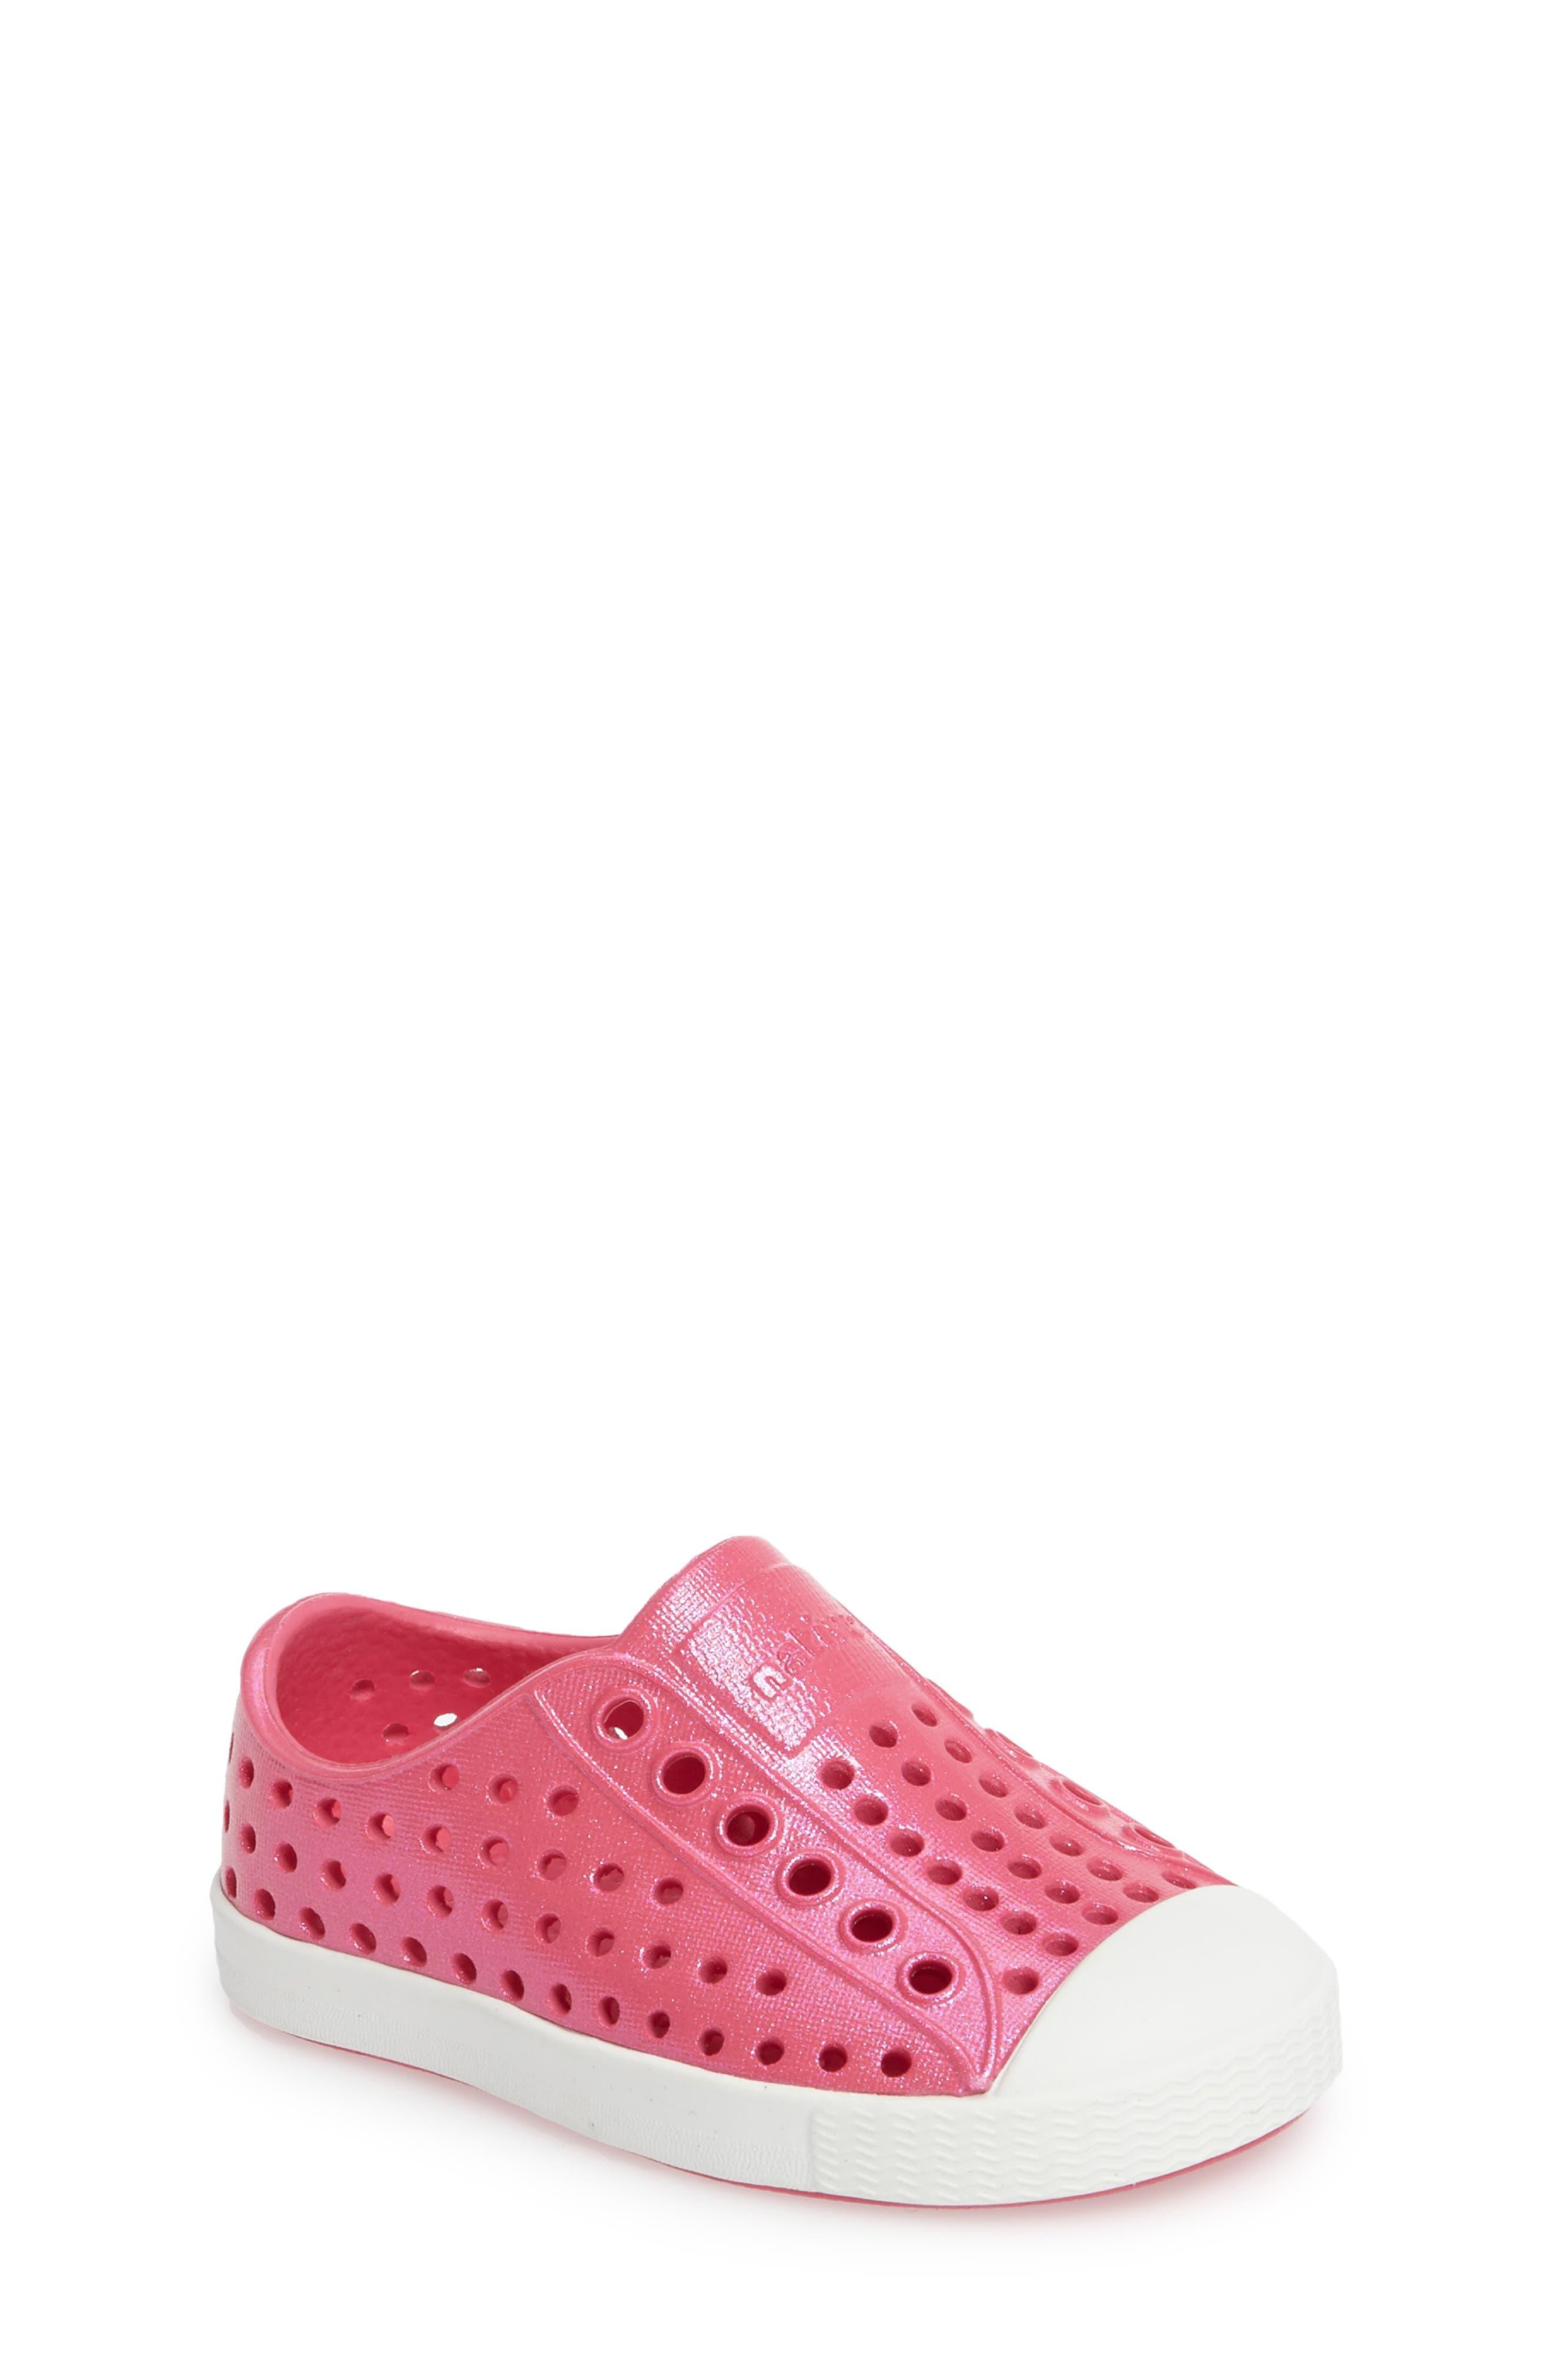 Native Shoes 'Jefferson' Iridescent Slip-On Sneaker (Baby, Walker, Toddler & Little Kid)